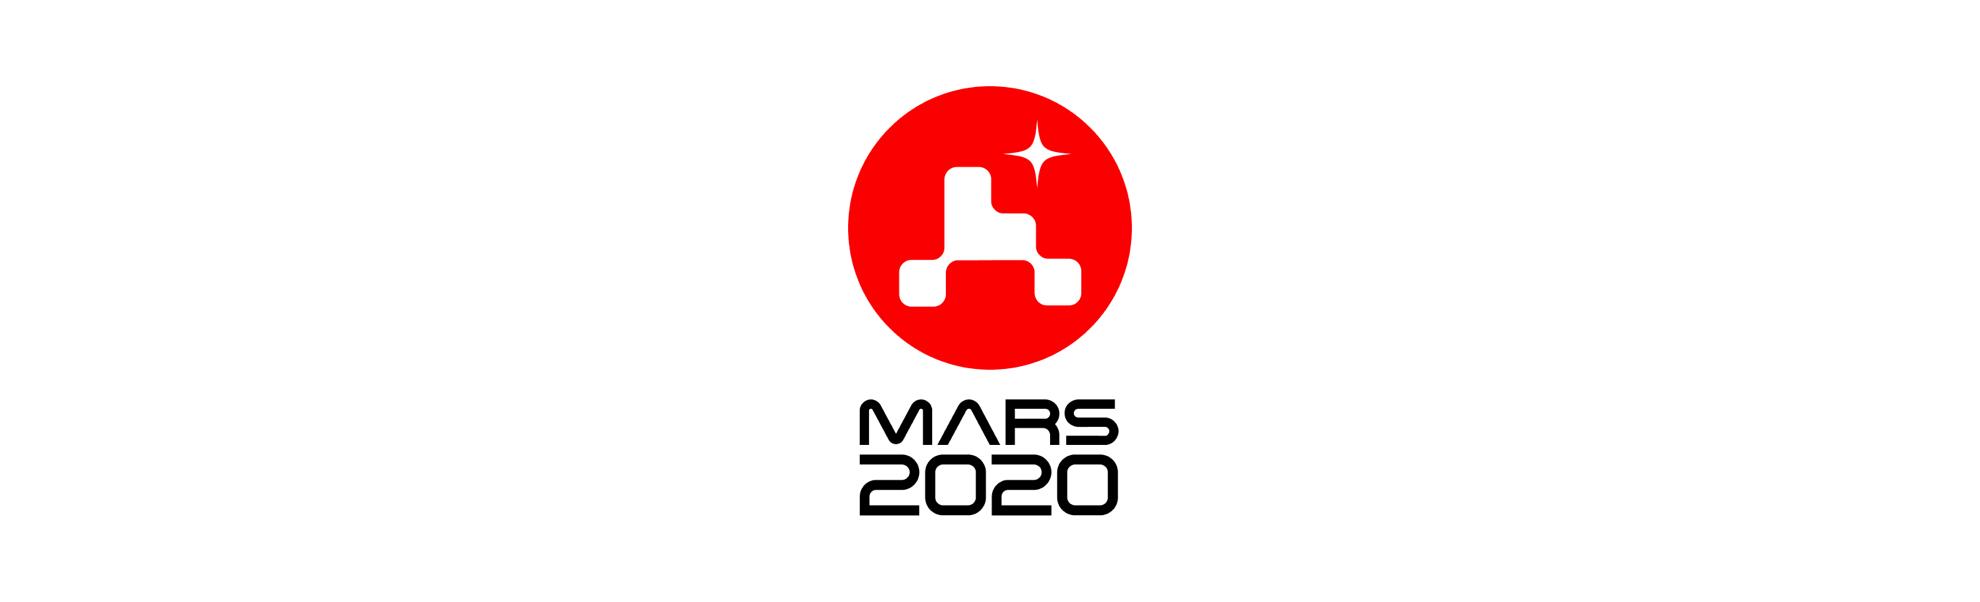 logo misji Mars 2020 odHouse of van Schneider